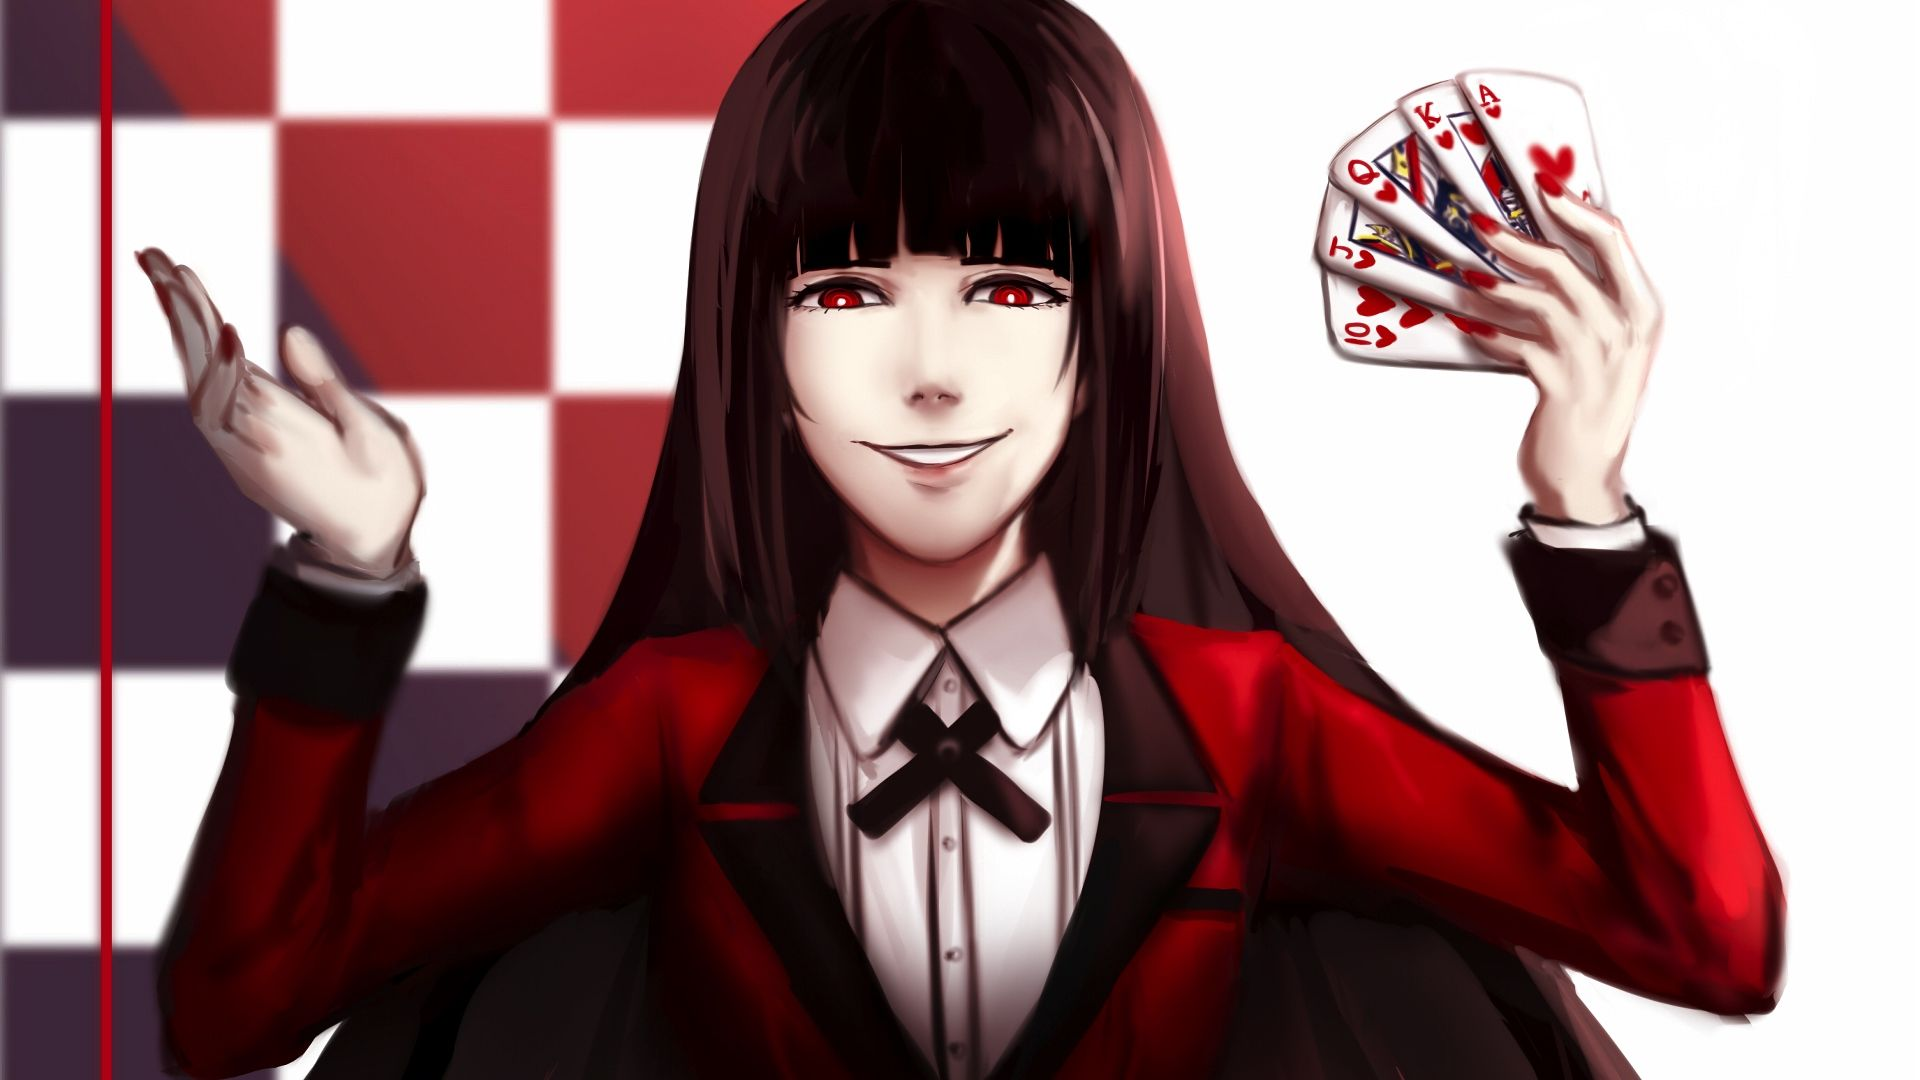 Desktop Wallpaper Anime Girl, Yumeko Jabami, Kakegurui